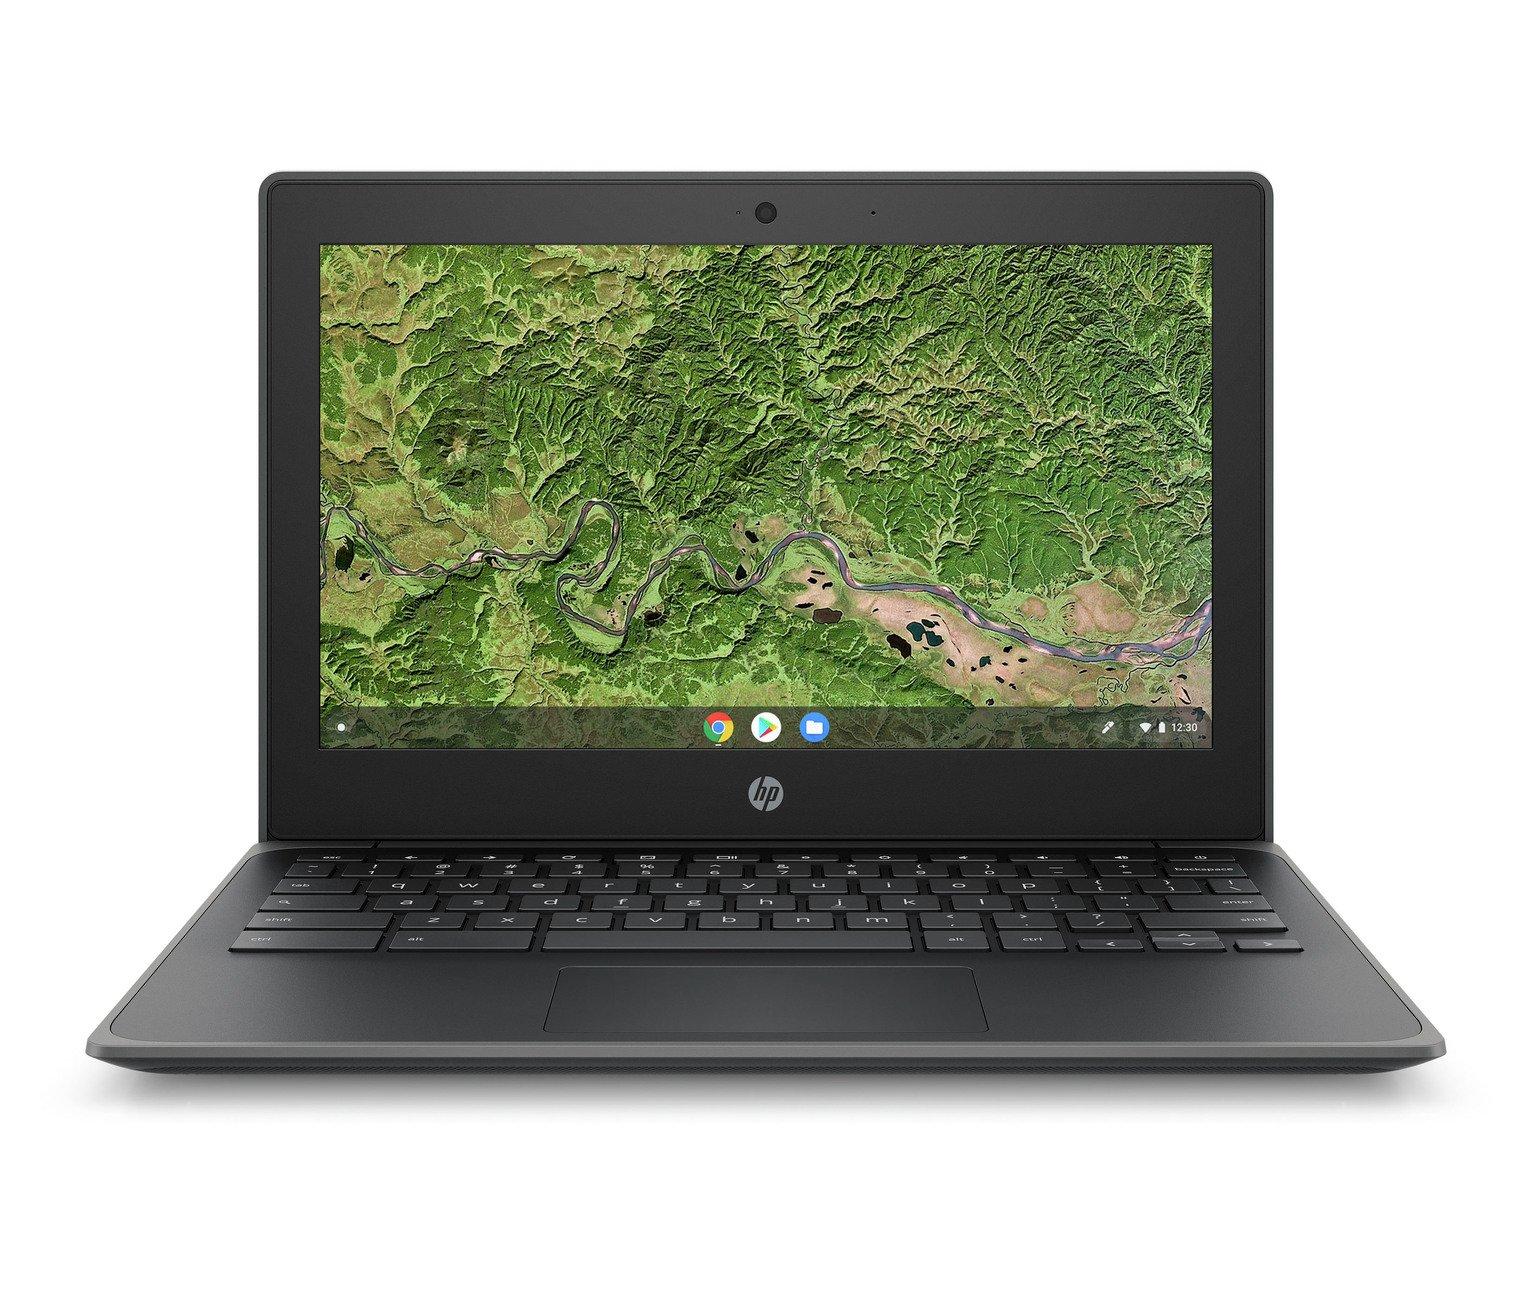 HP 11A G8 EE 11.6in A4 4GB 16GB Chromebook